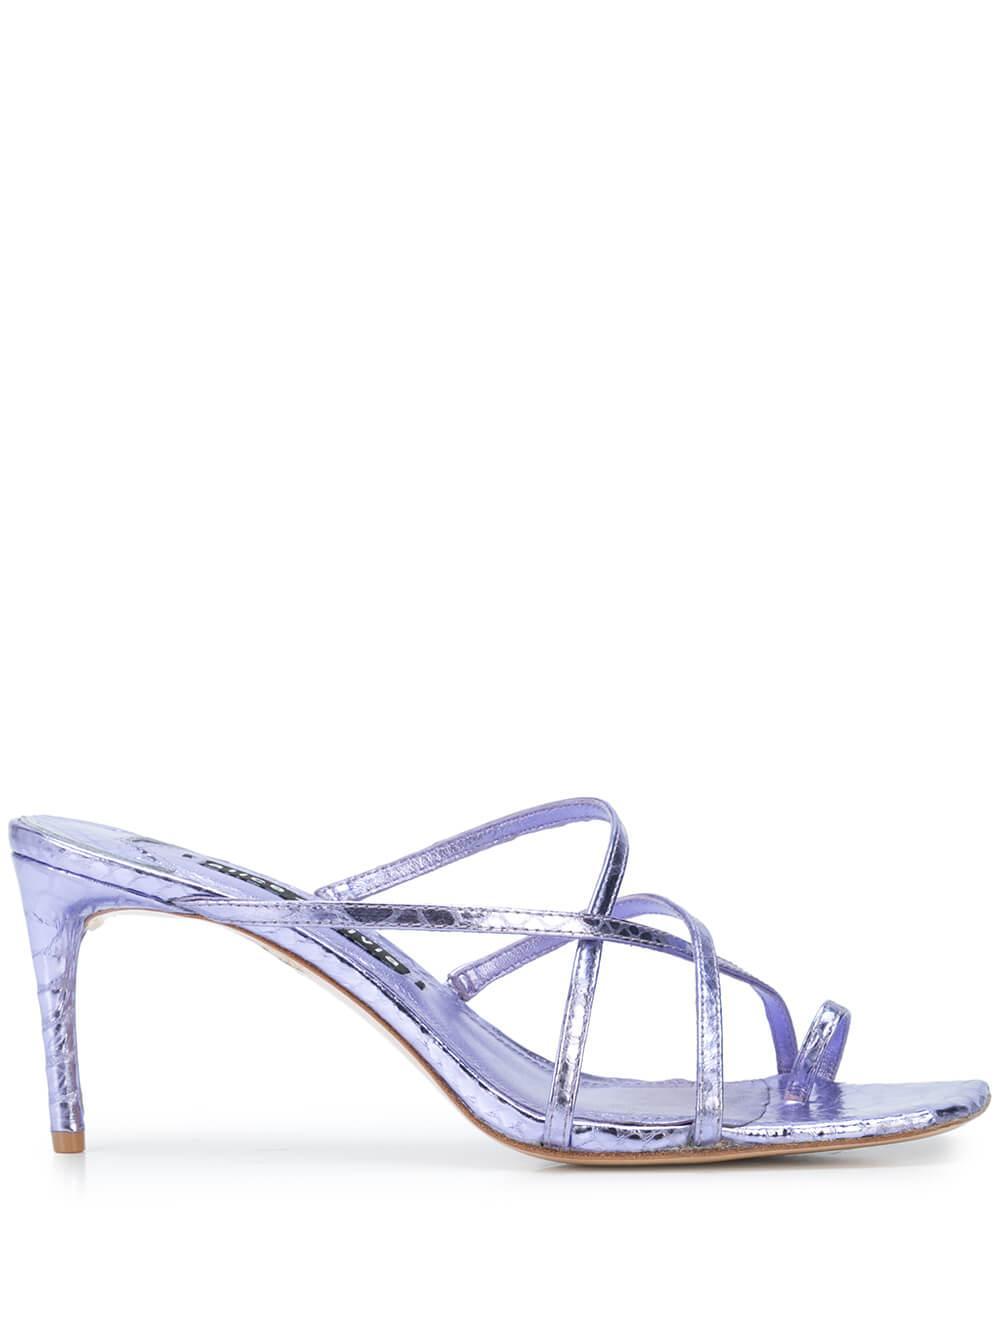 Strappy Square Toe Sandal Item # SABRINE